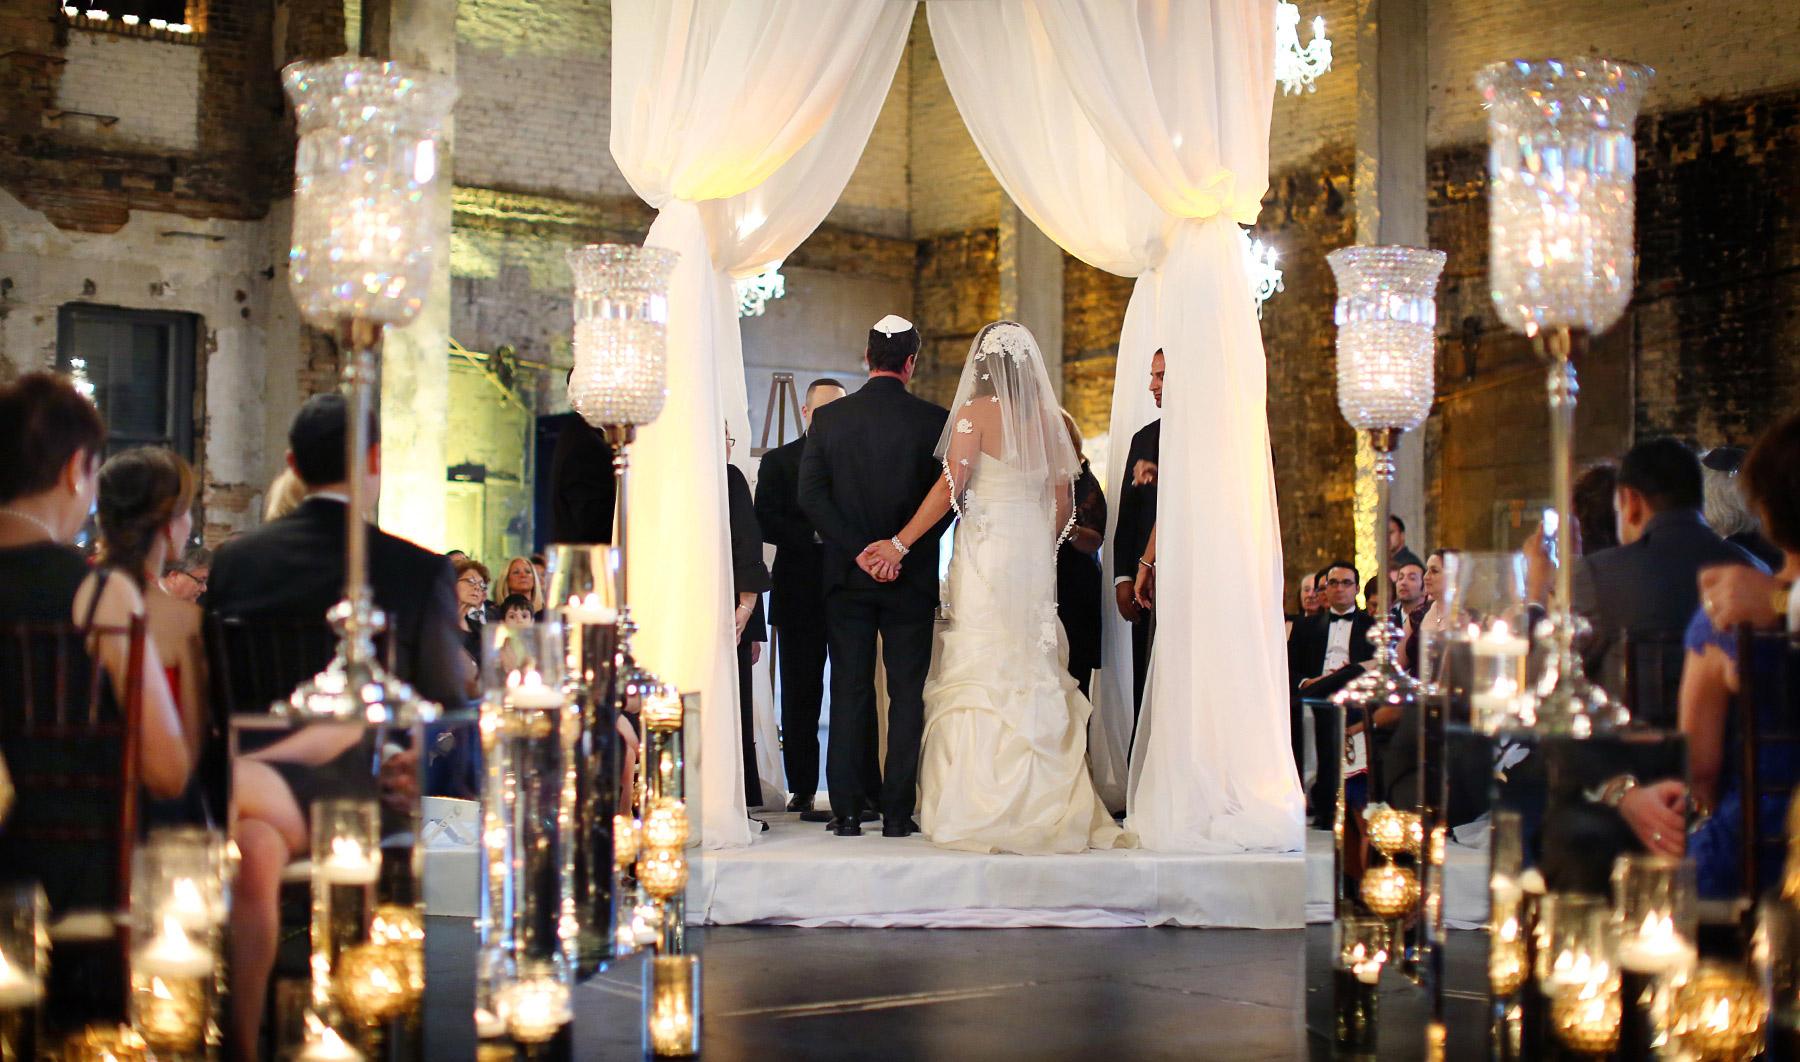 10-Minneapolis-Minnesota-Wedding-Photography-by-Vick-Photography-Aria-Downtown-Ceremony-Layne-&-Dan.jpg